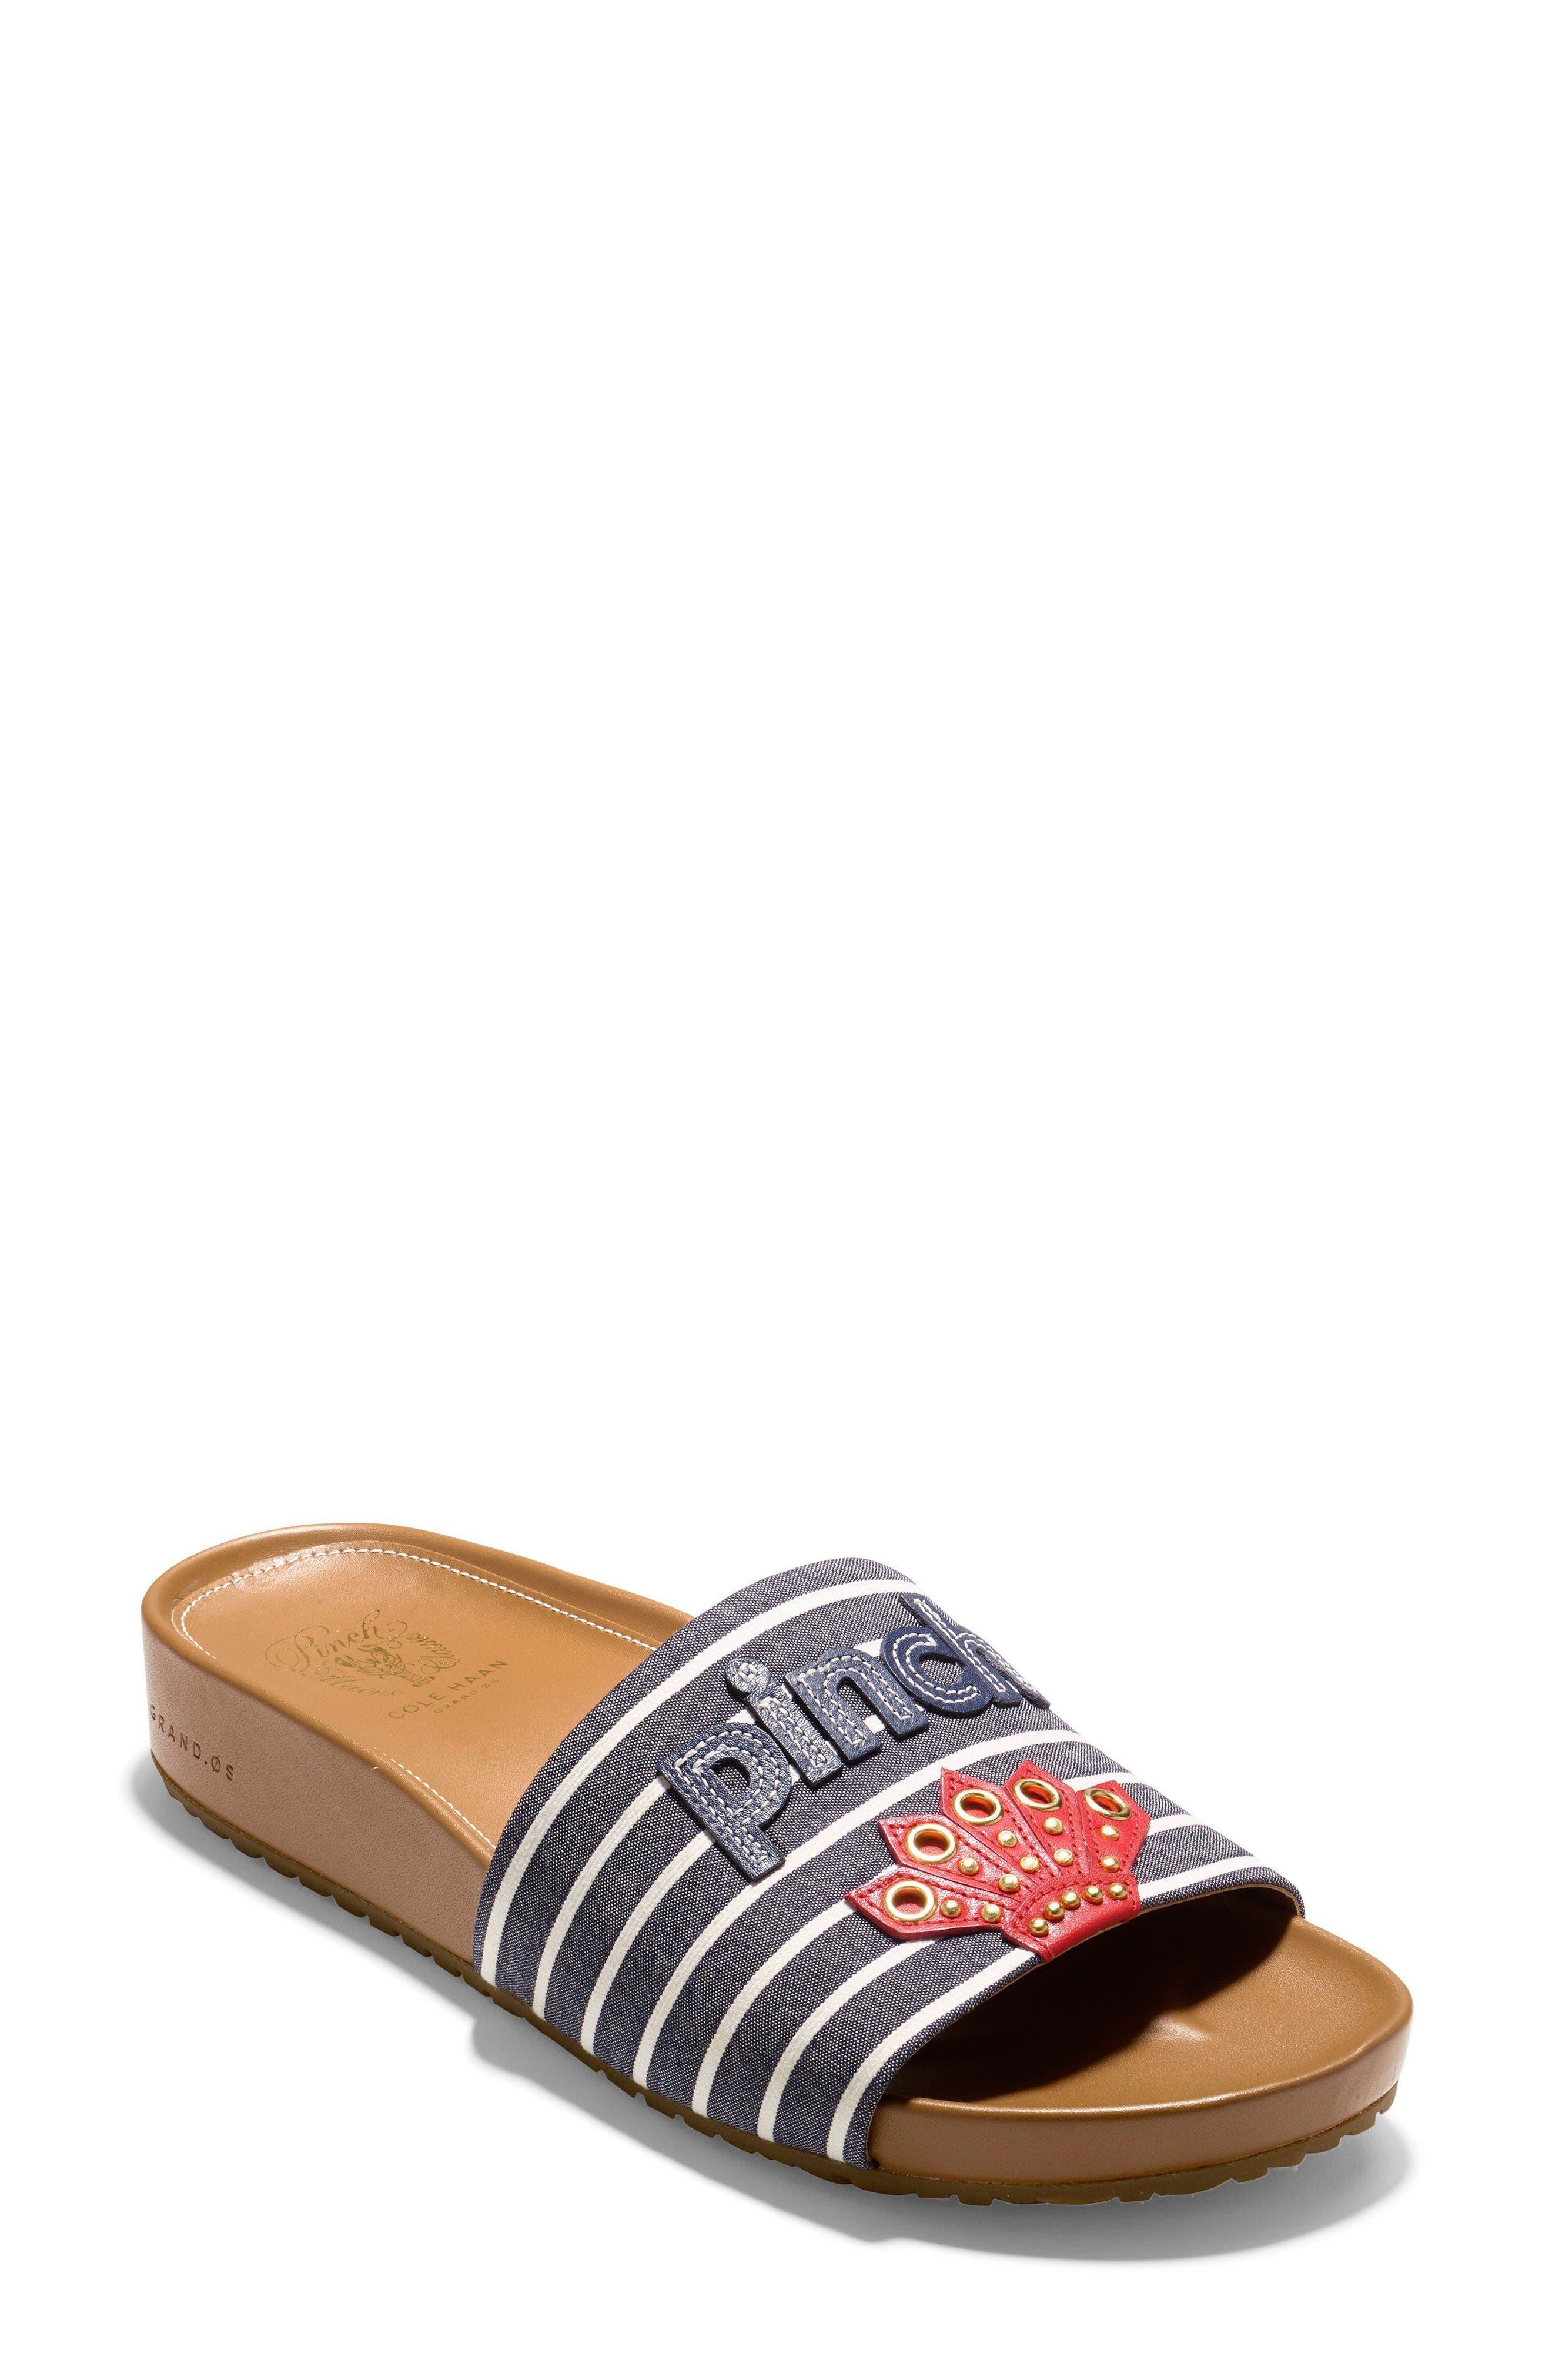 Pinch Montauk Lobster Slide Sandal,                             Main thumbnail 2, color,